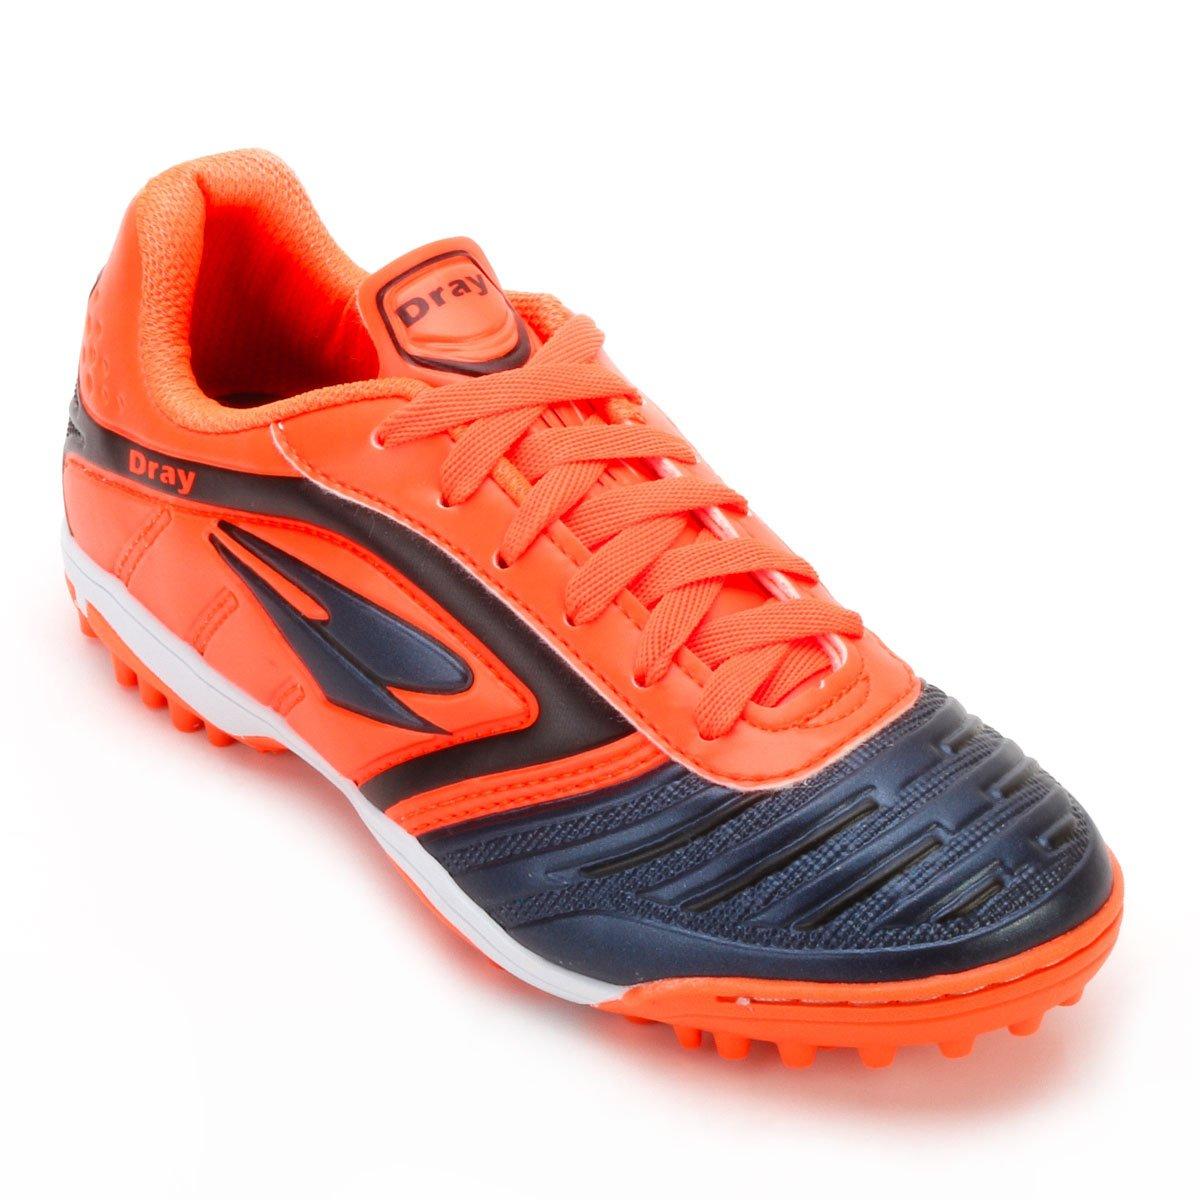 81b871774fe4e Chuteira Dray Topfly Society 363CO - Compre Agora   Netshoes